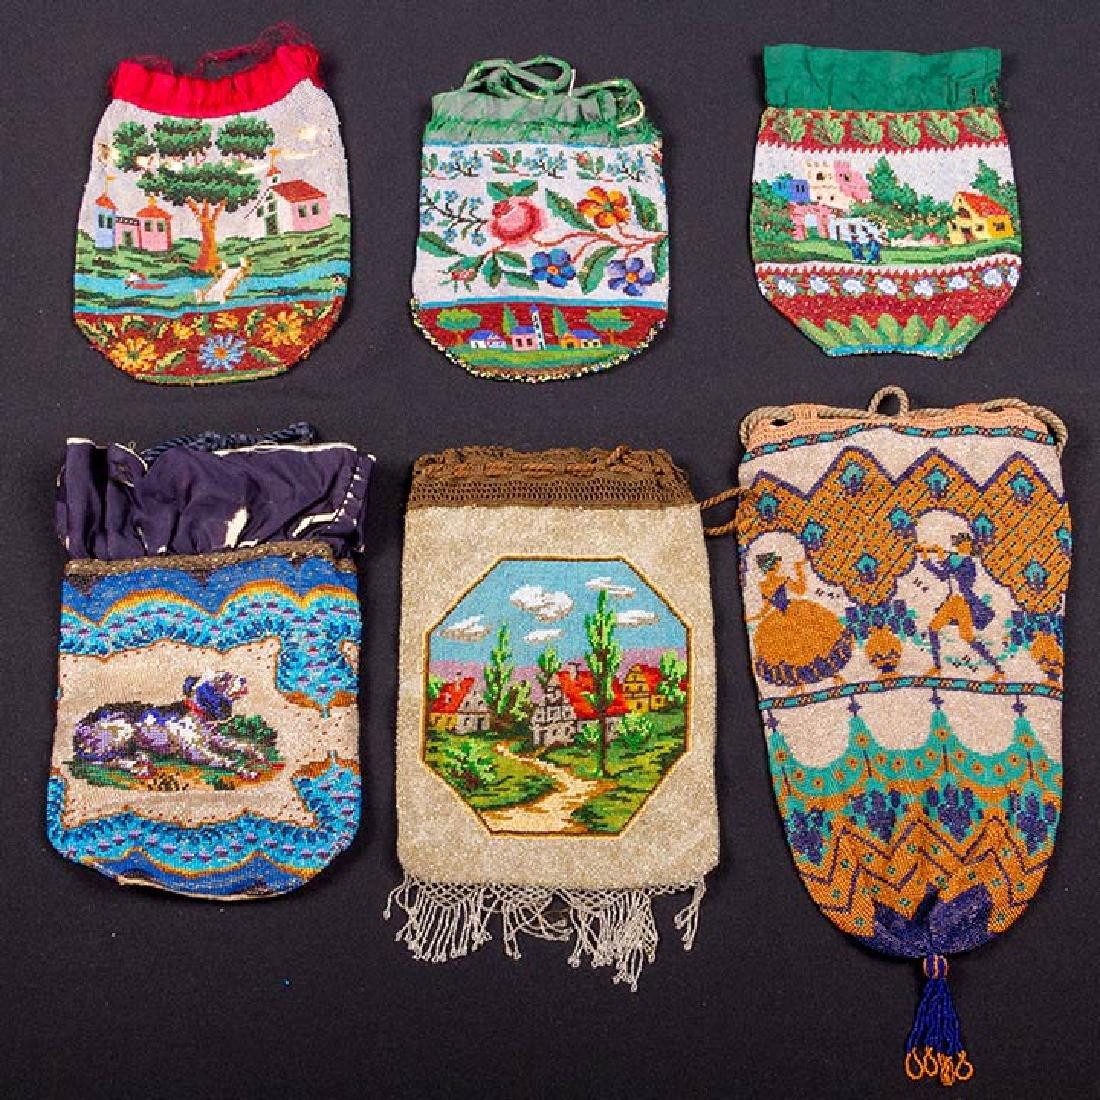 6 PICTORIAL BEADED BAGS, 1840-1900 - 2